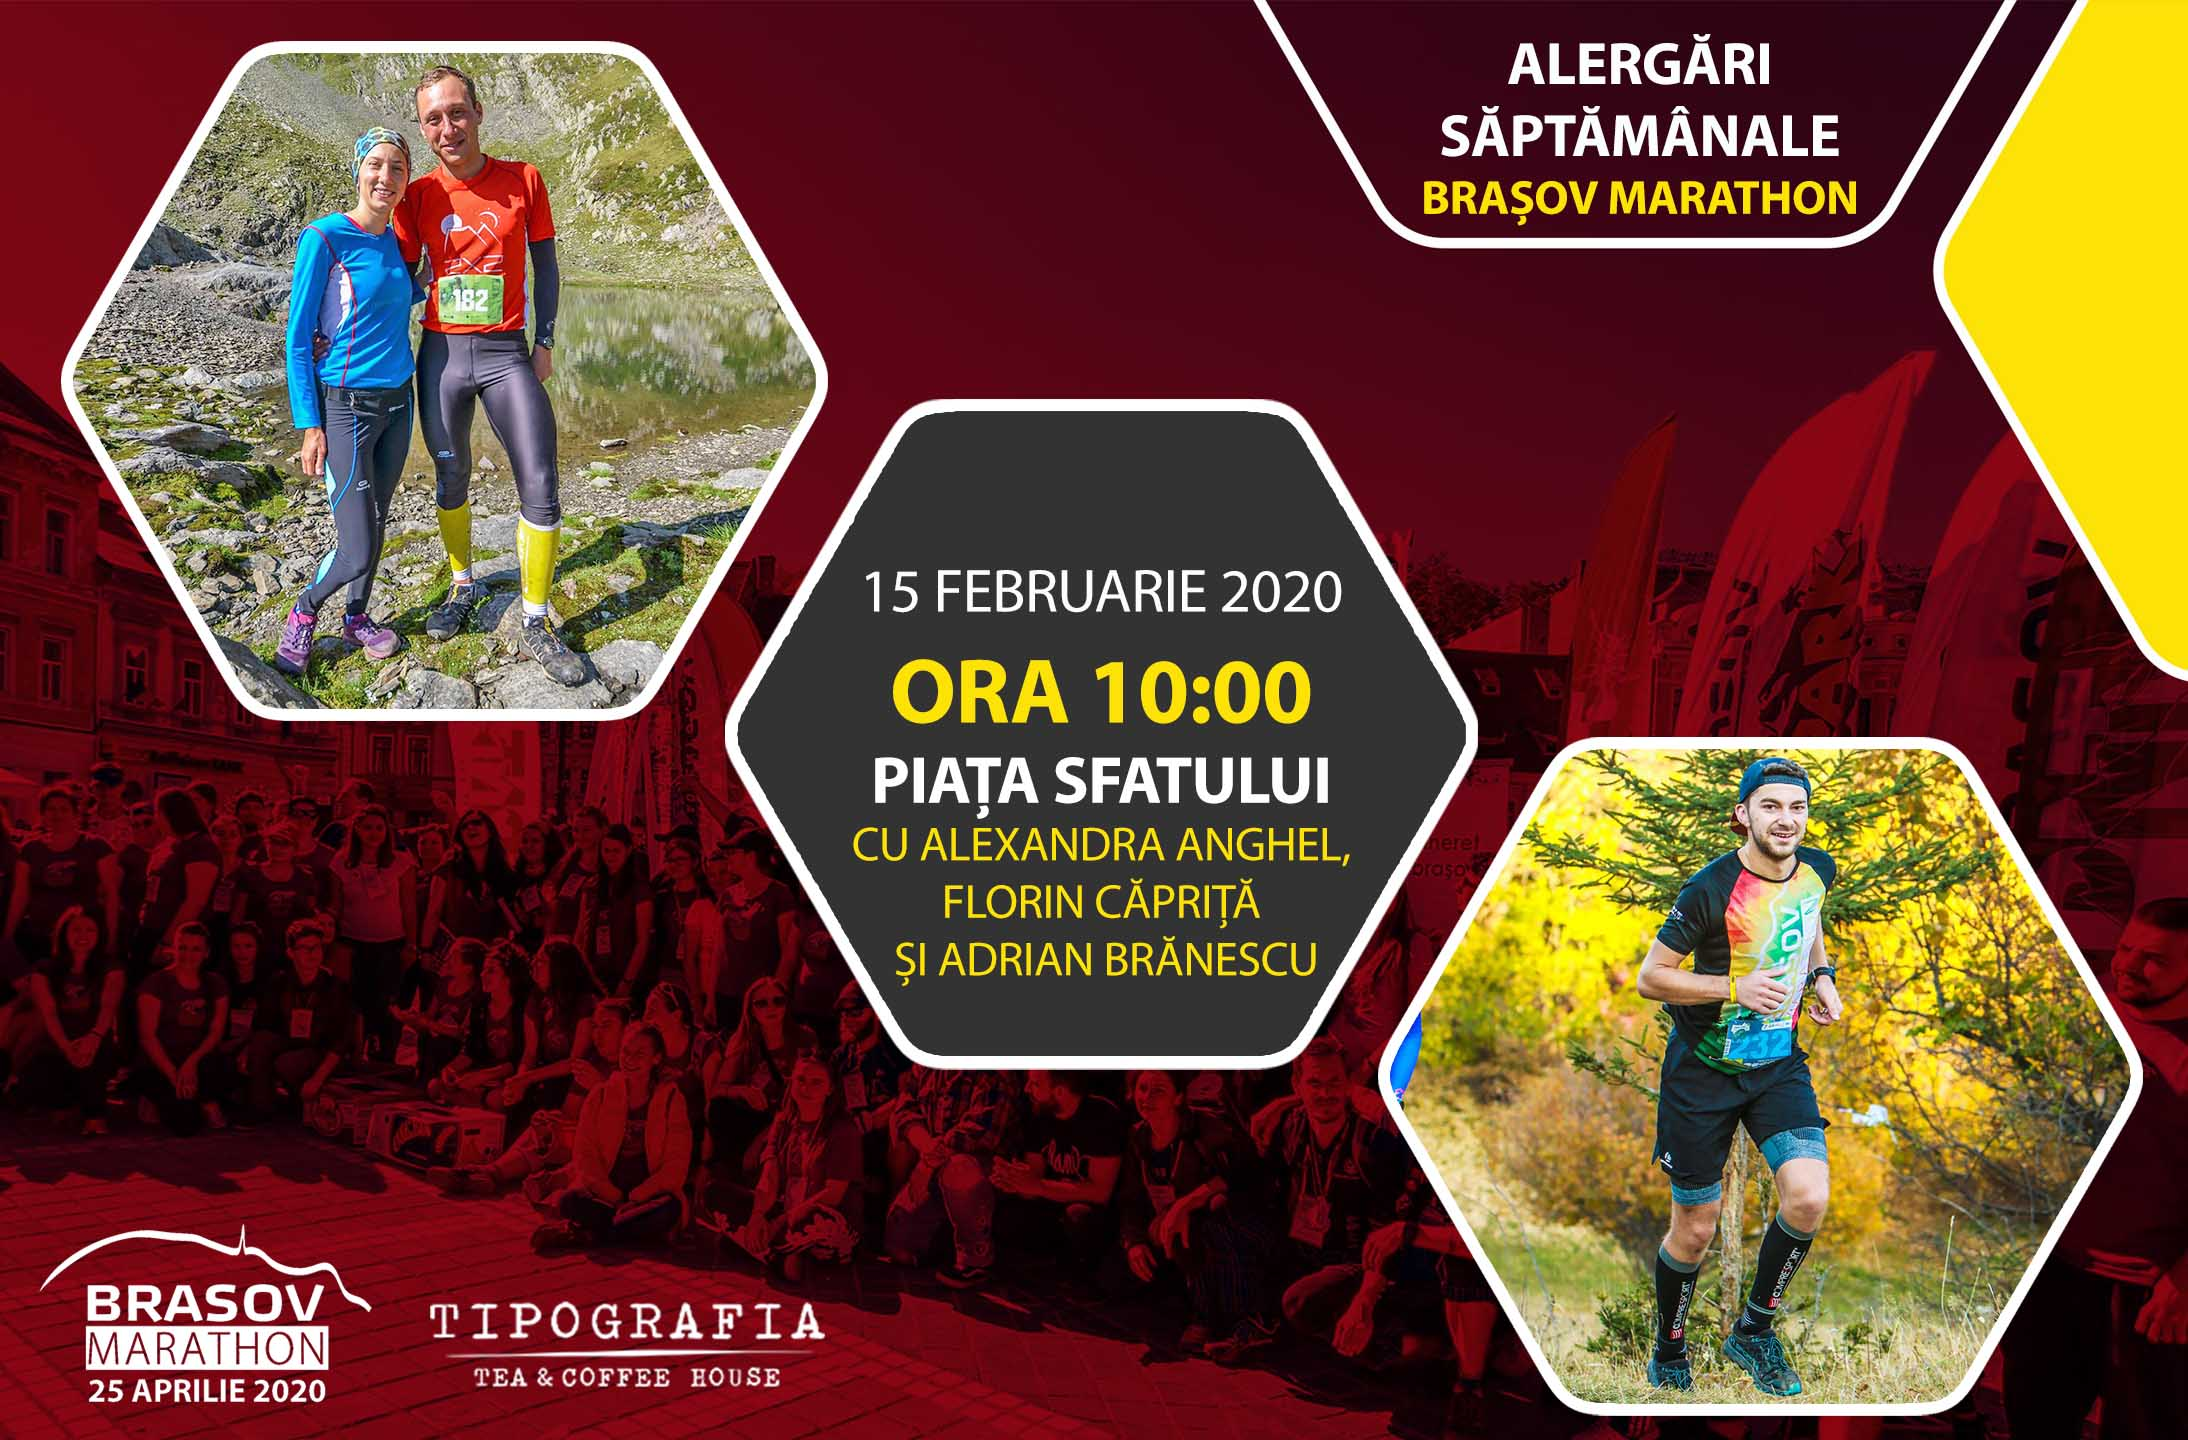 Brasov_marathon ALERGARE 15 FEBRUARIE 2020 redimensionata